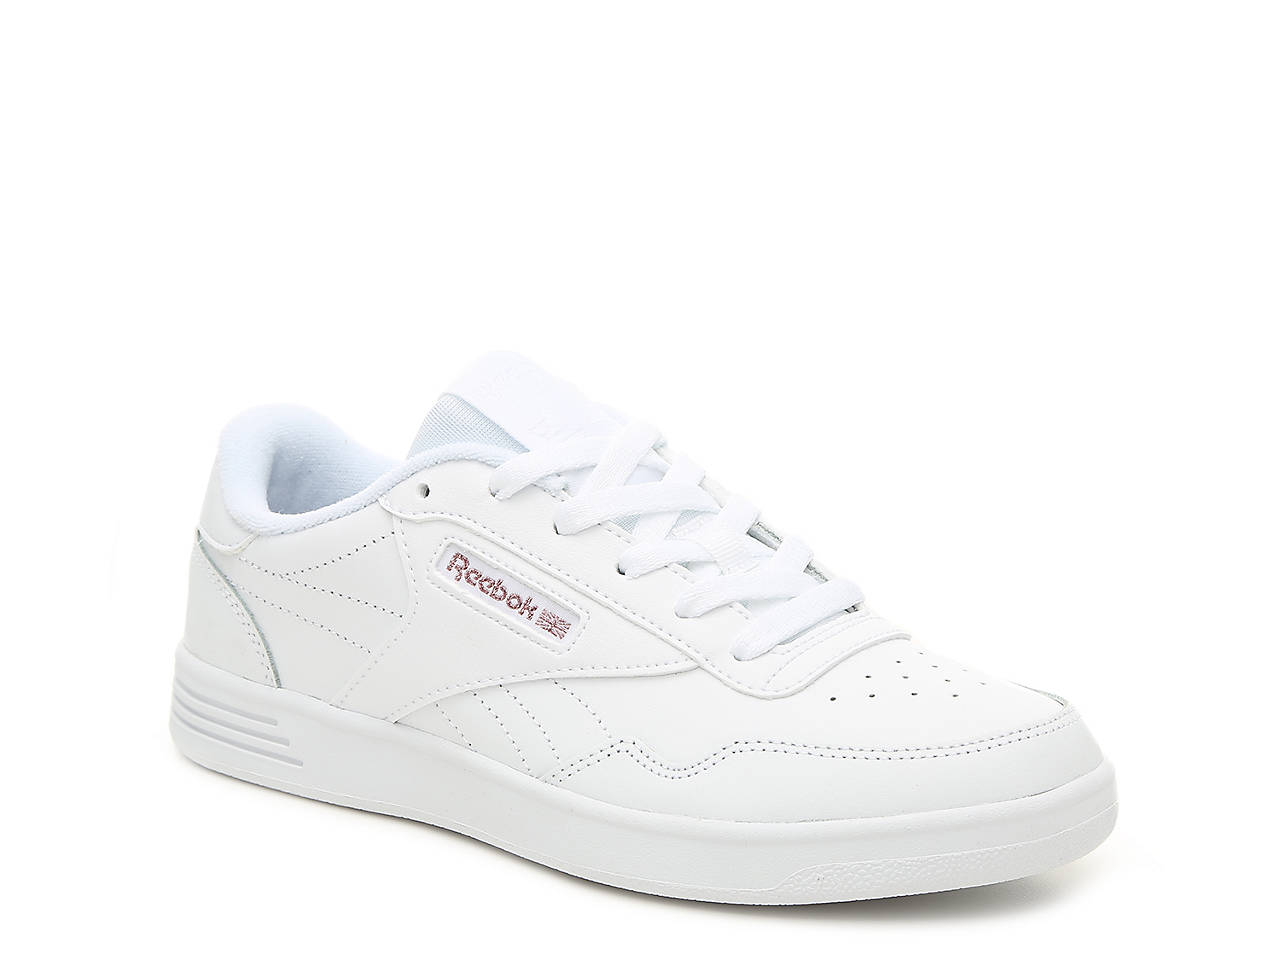 bb089de5a5c6 Reebok Club Memt Sneaker - Women s Women s Shoes